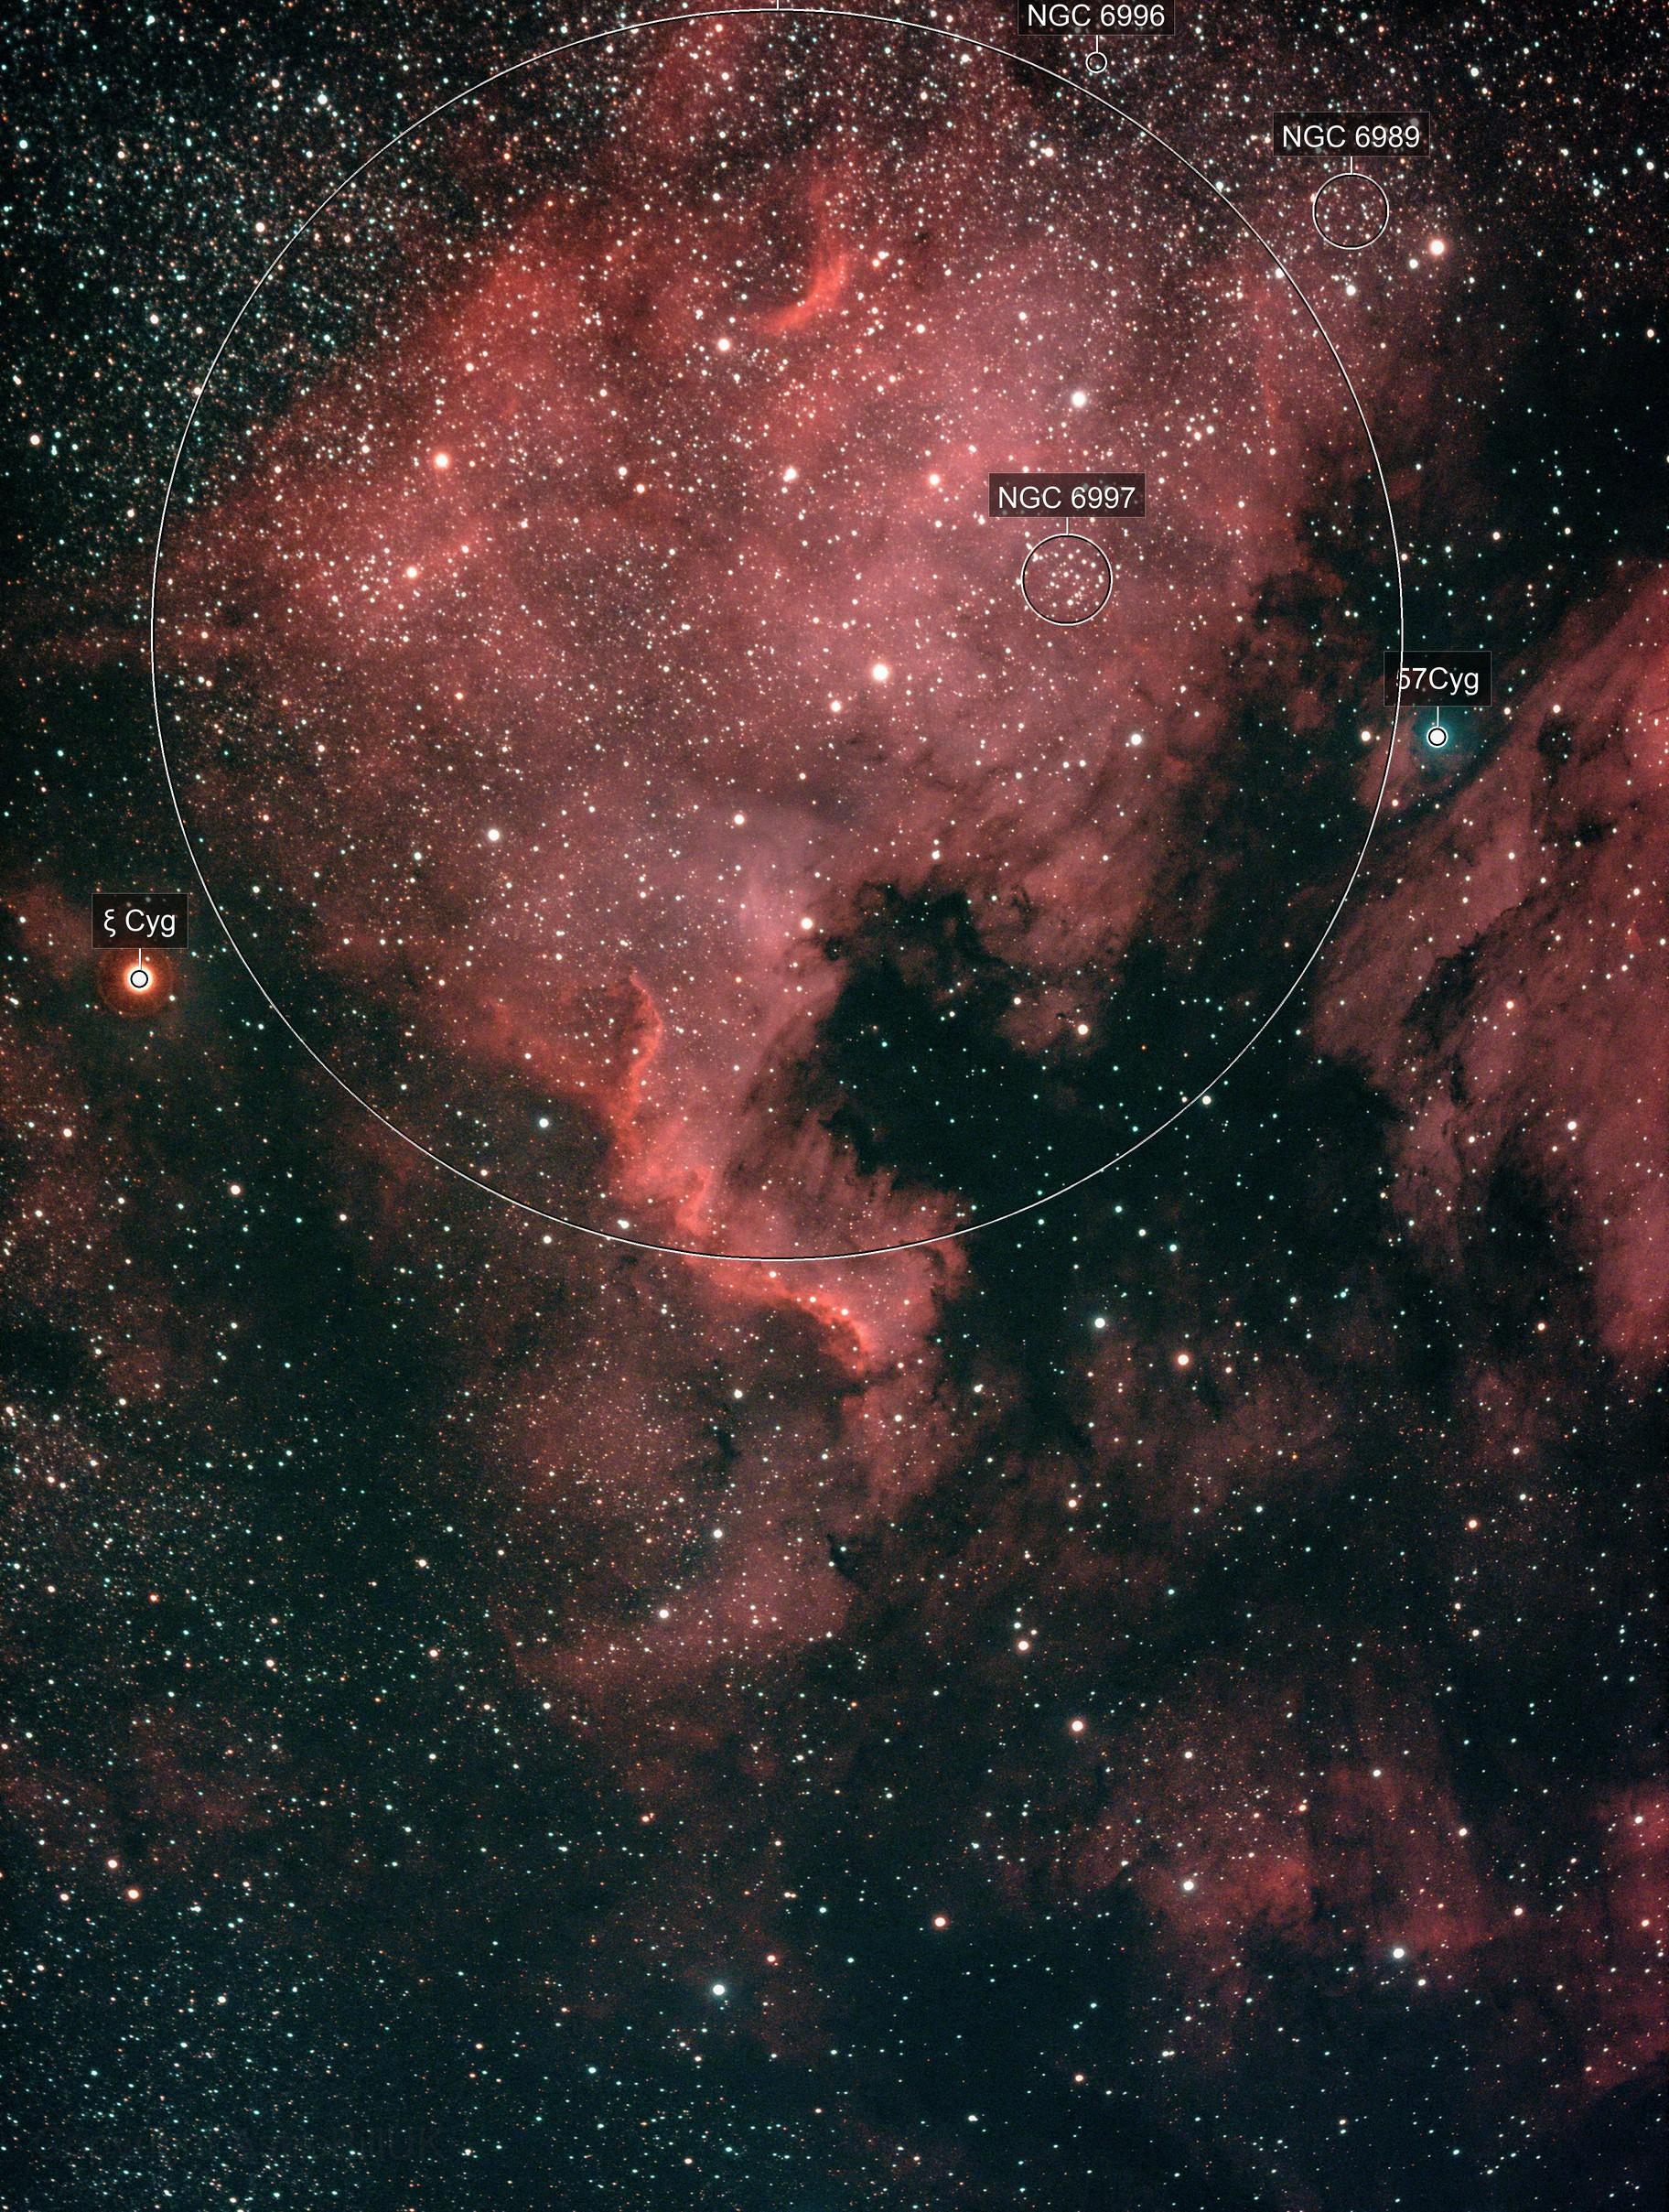 North America Nebula on Sharpstar 61 EDPH II with Altair Hypercam 269c (85% moon)